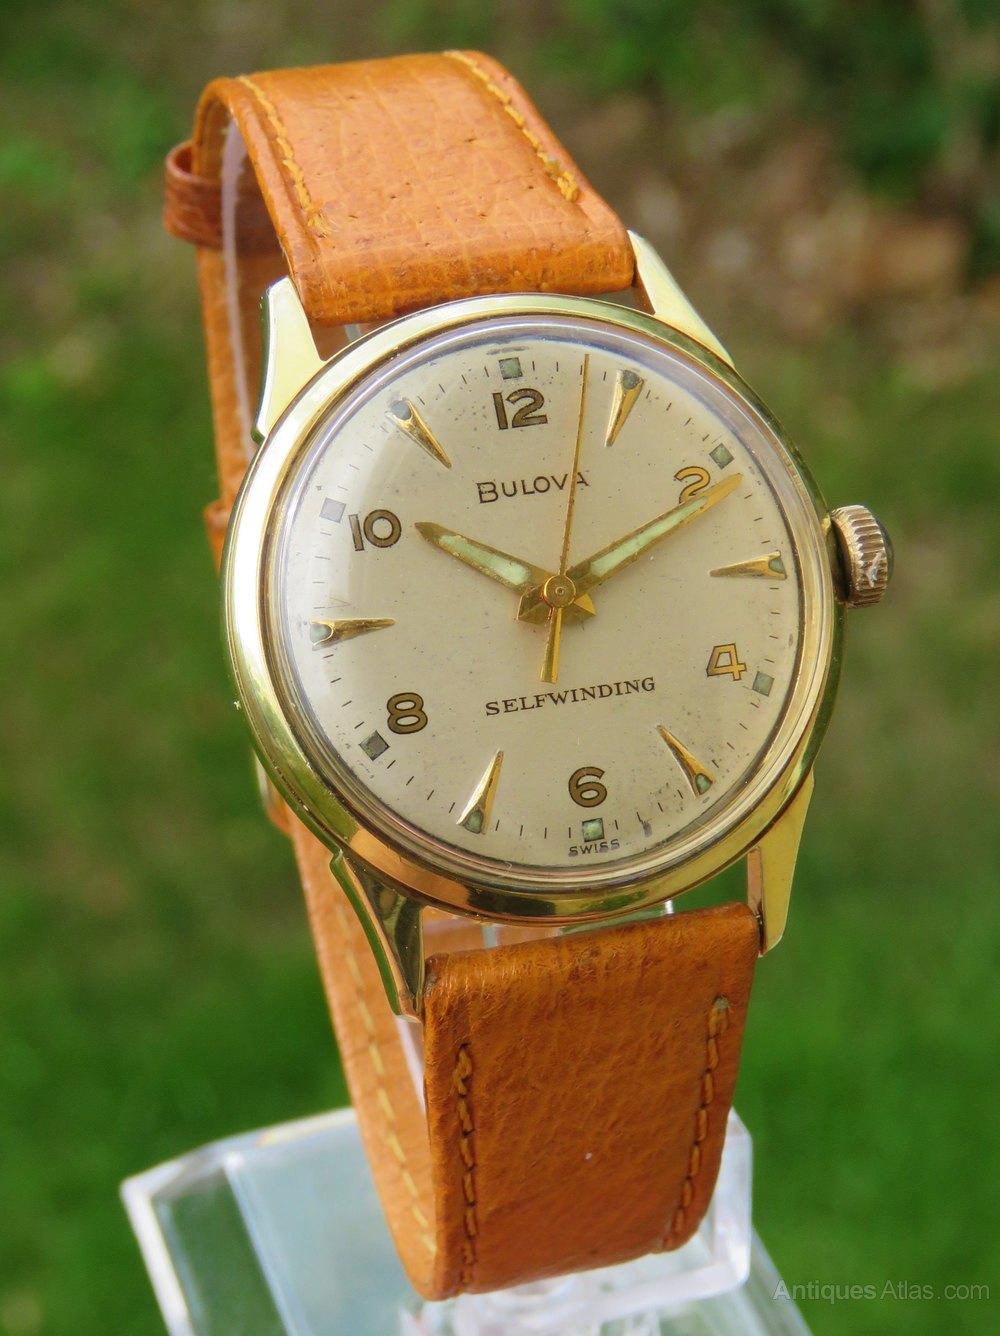 Antiques Atlas - Gents 1969 Bulova Automatic Wrist Watch